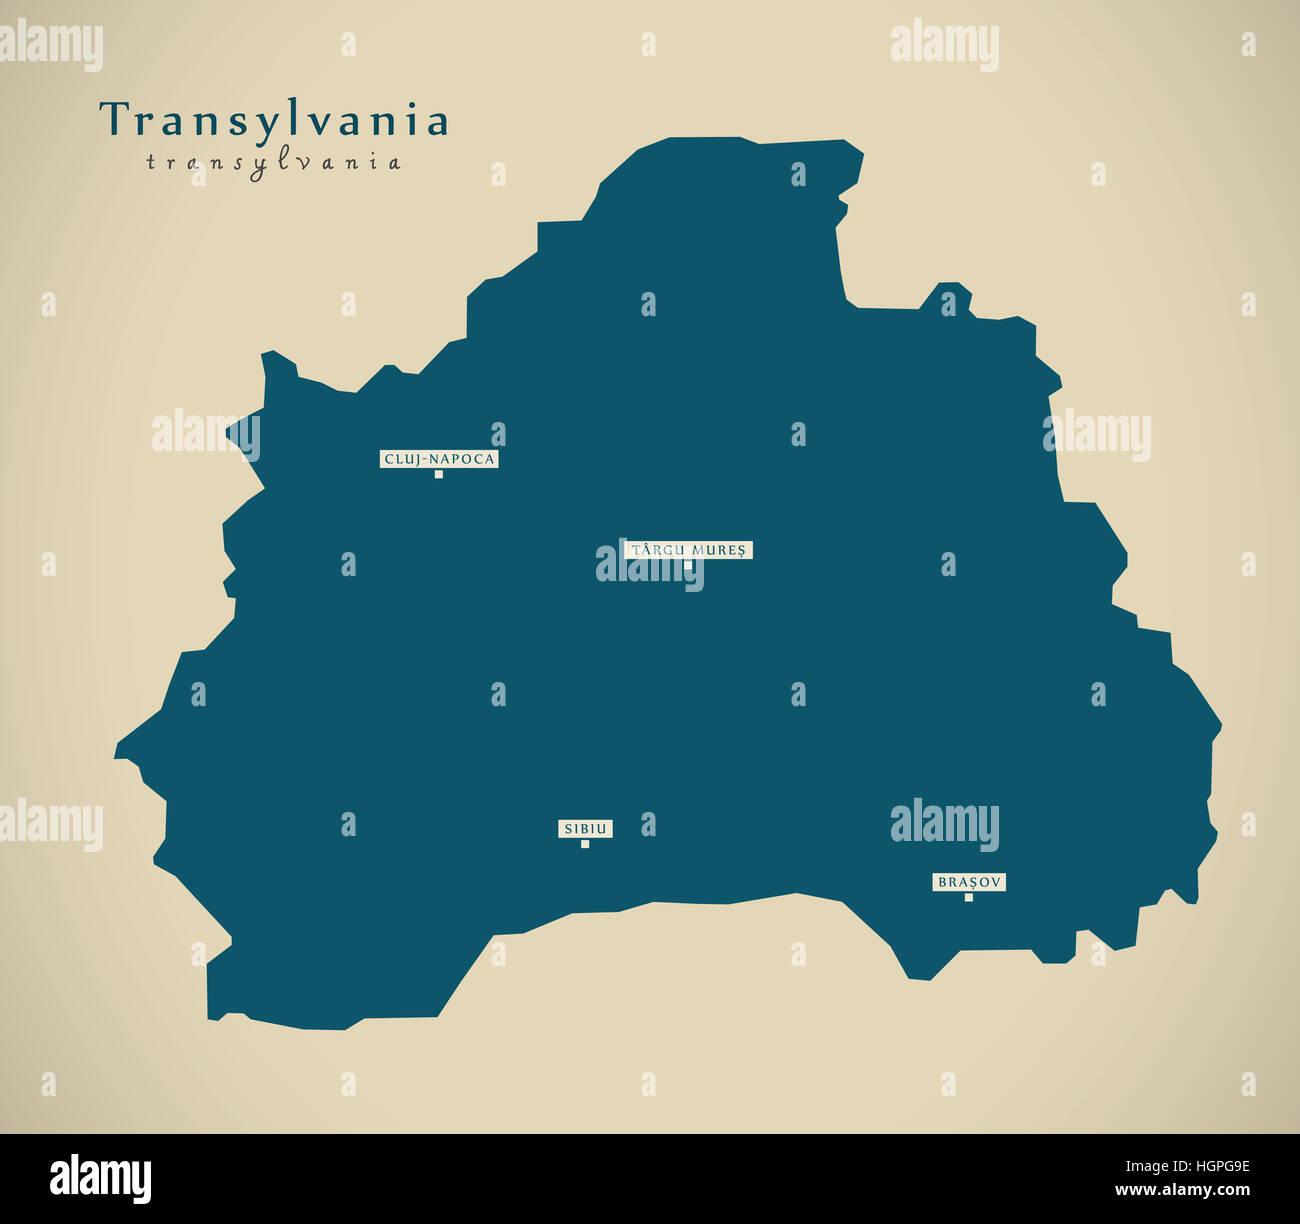 Modern Map - Transylvania Romania RO illustration - Stock Image